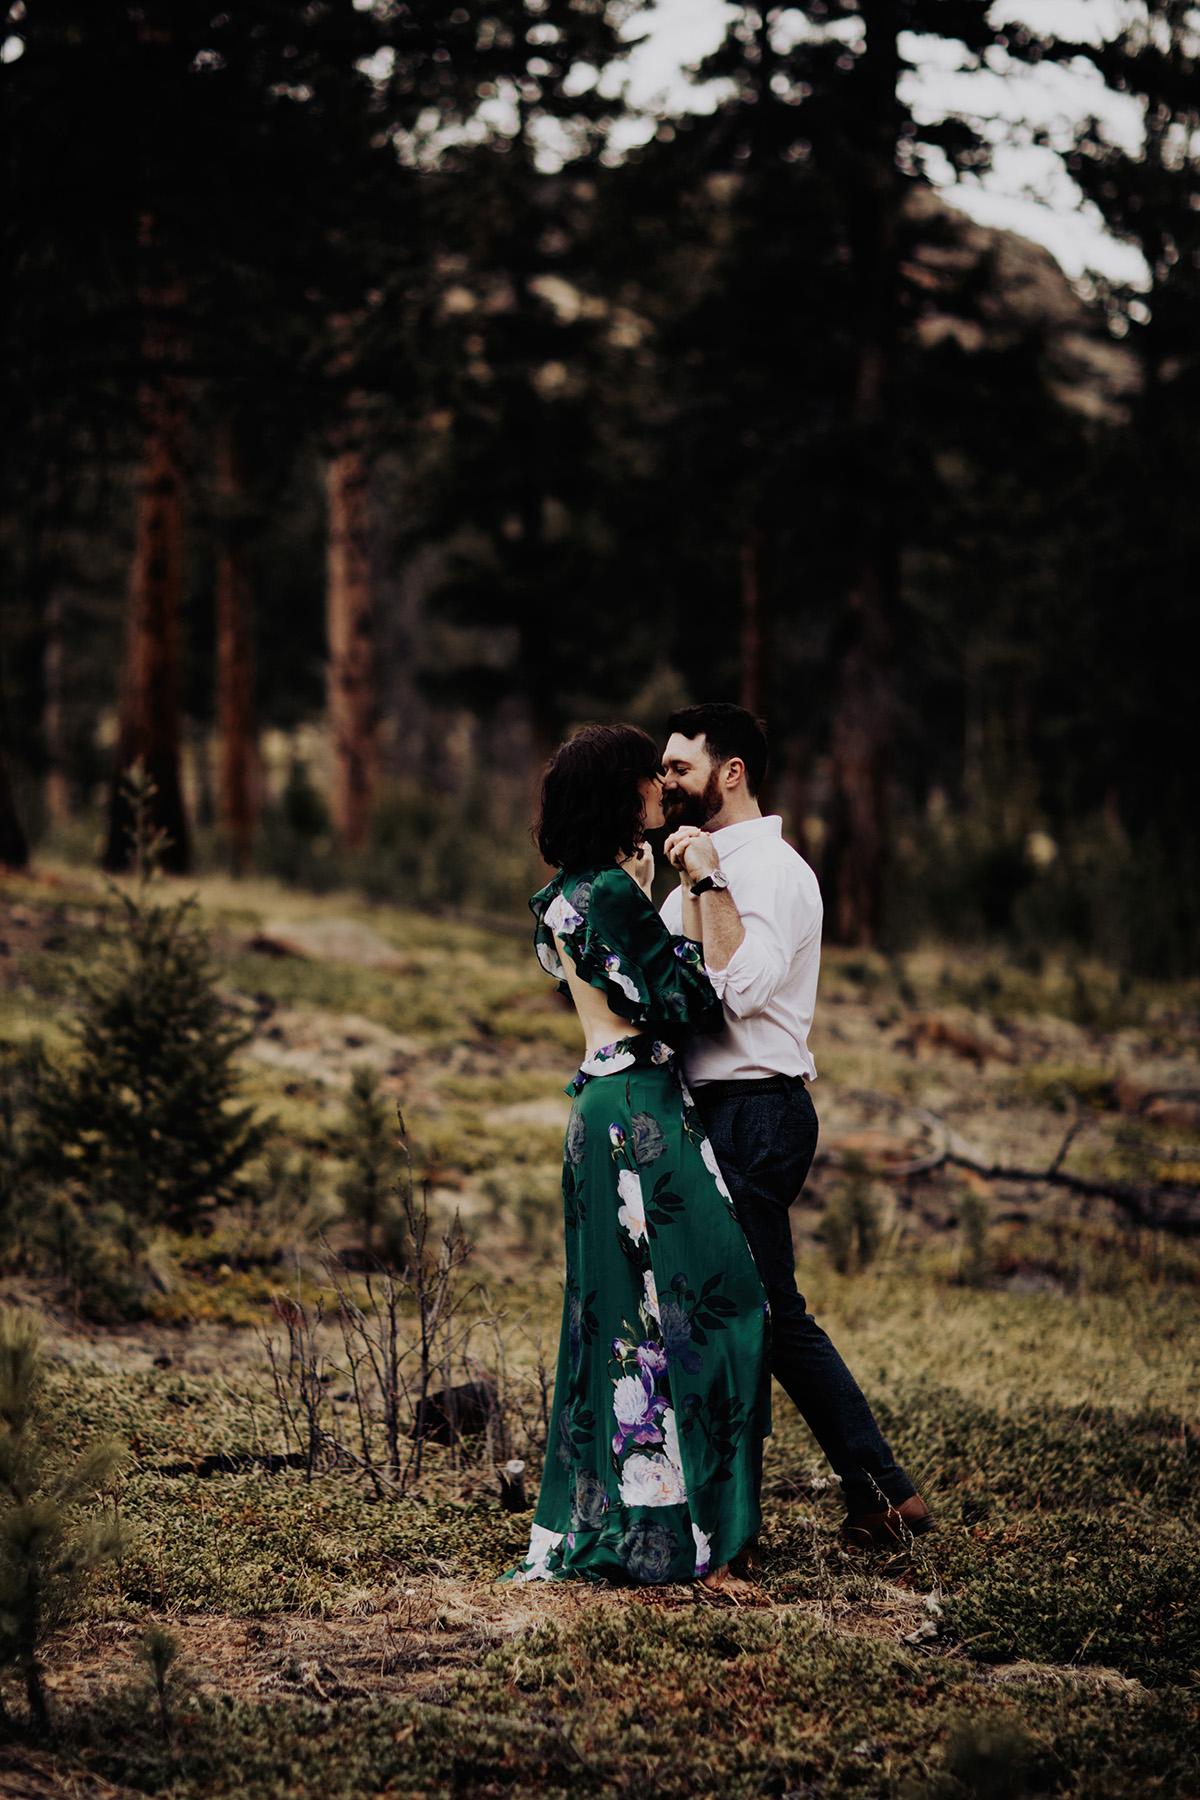 colorado-wedding-photographer-stauton-state-park-engagement-session-Sheena-Jared-024.jpg